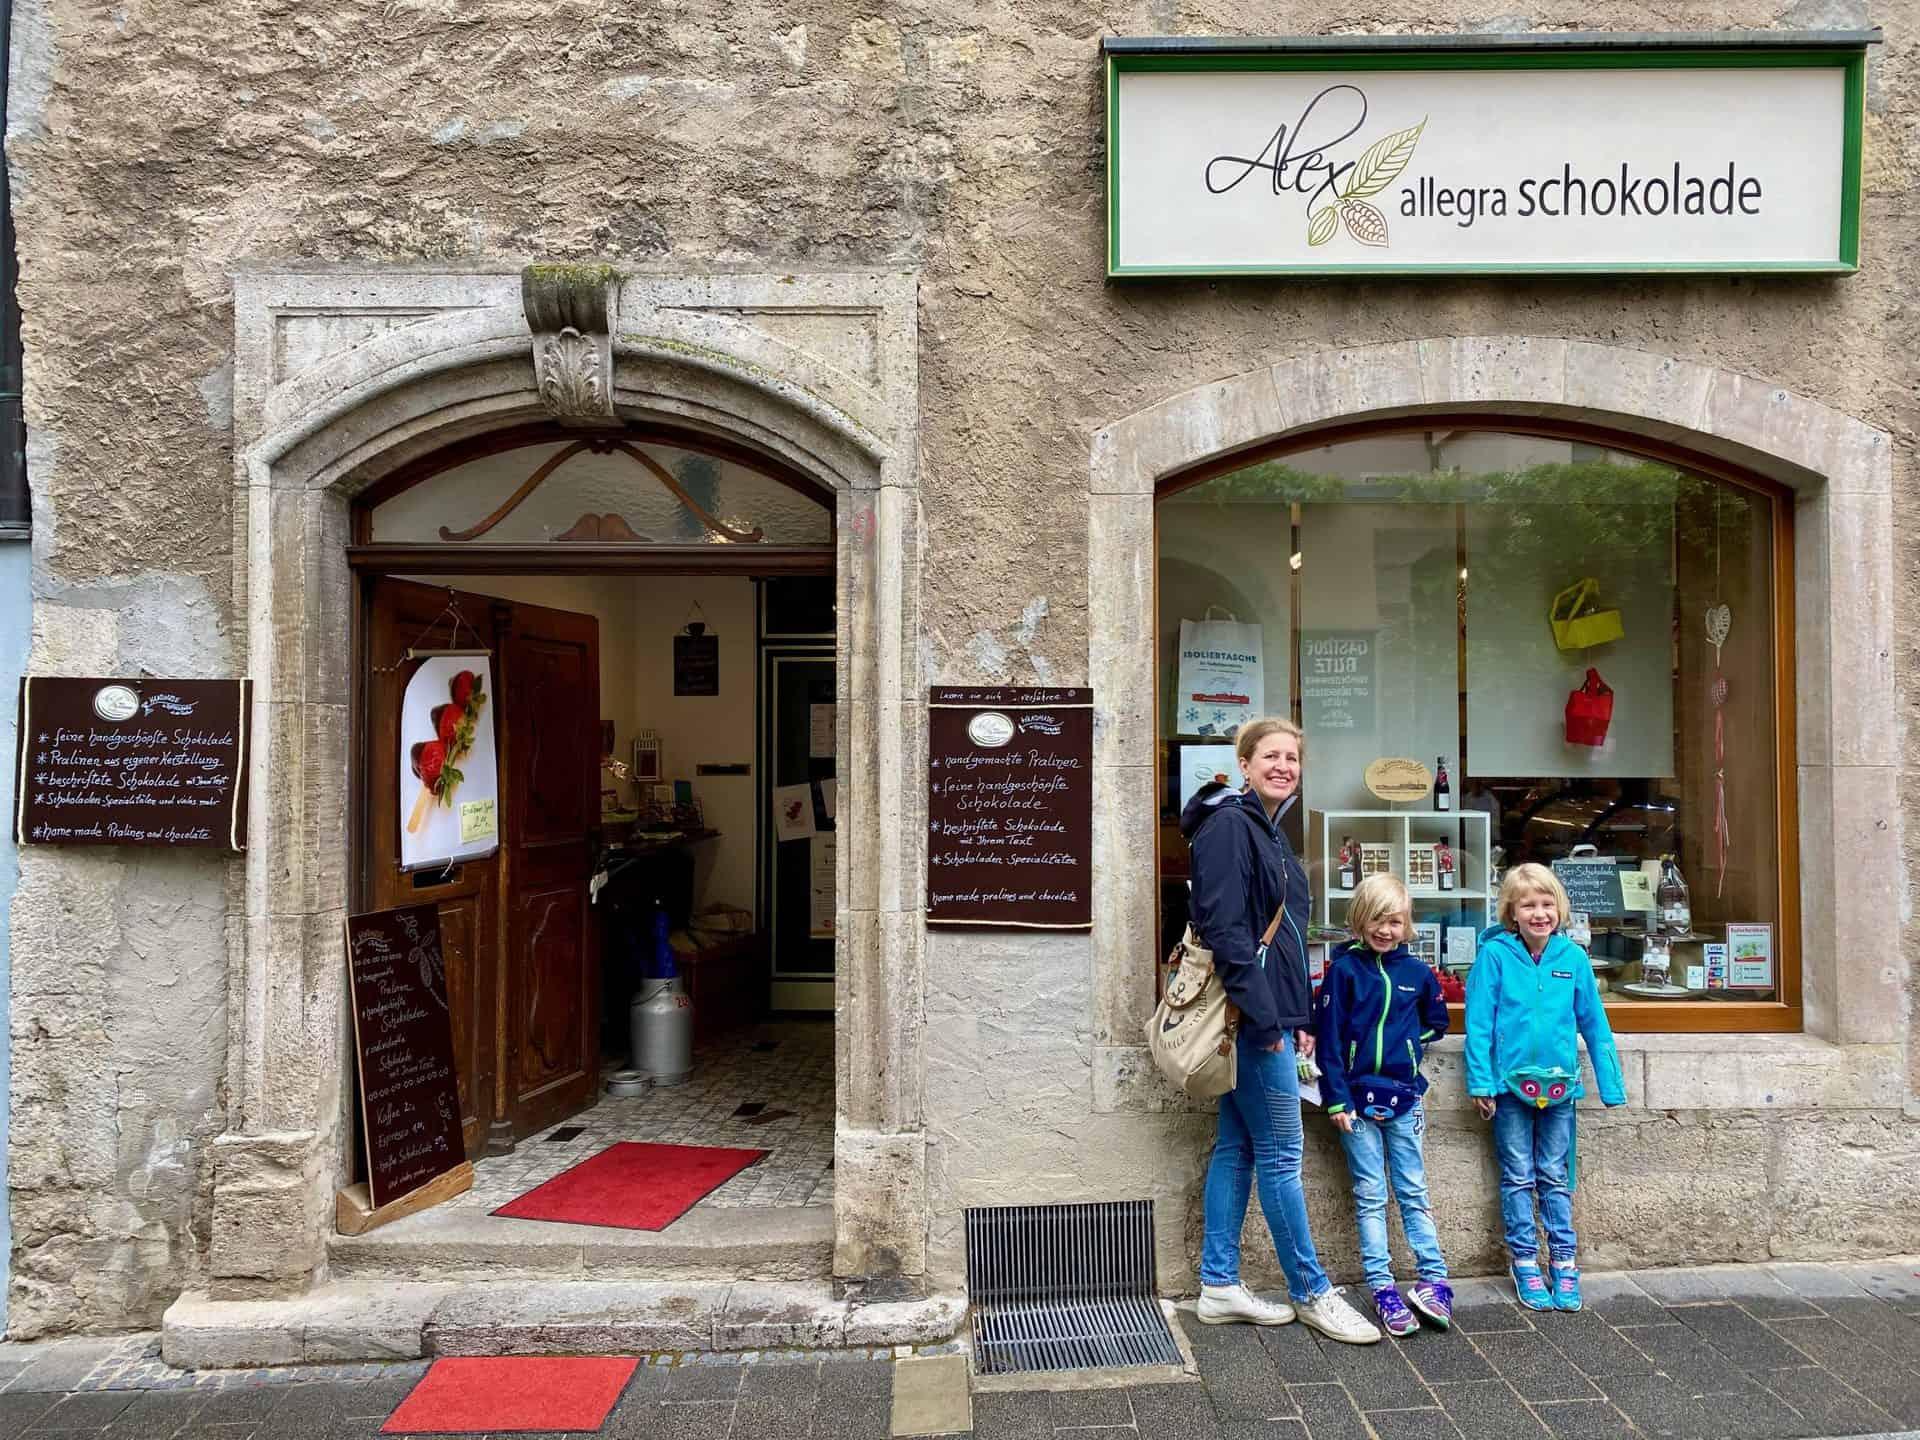 Rothenburg-ob-der-Tauber-Alex-Alexgra-Schokolade